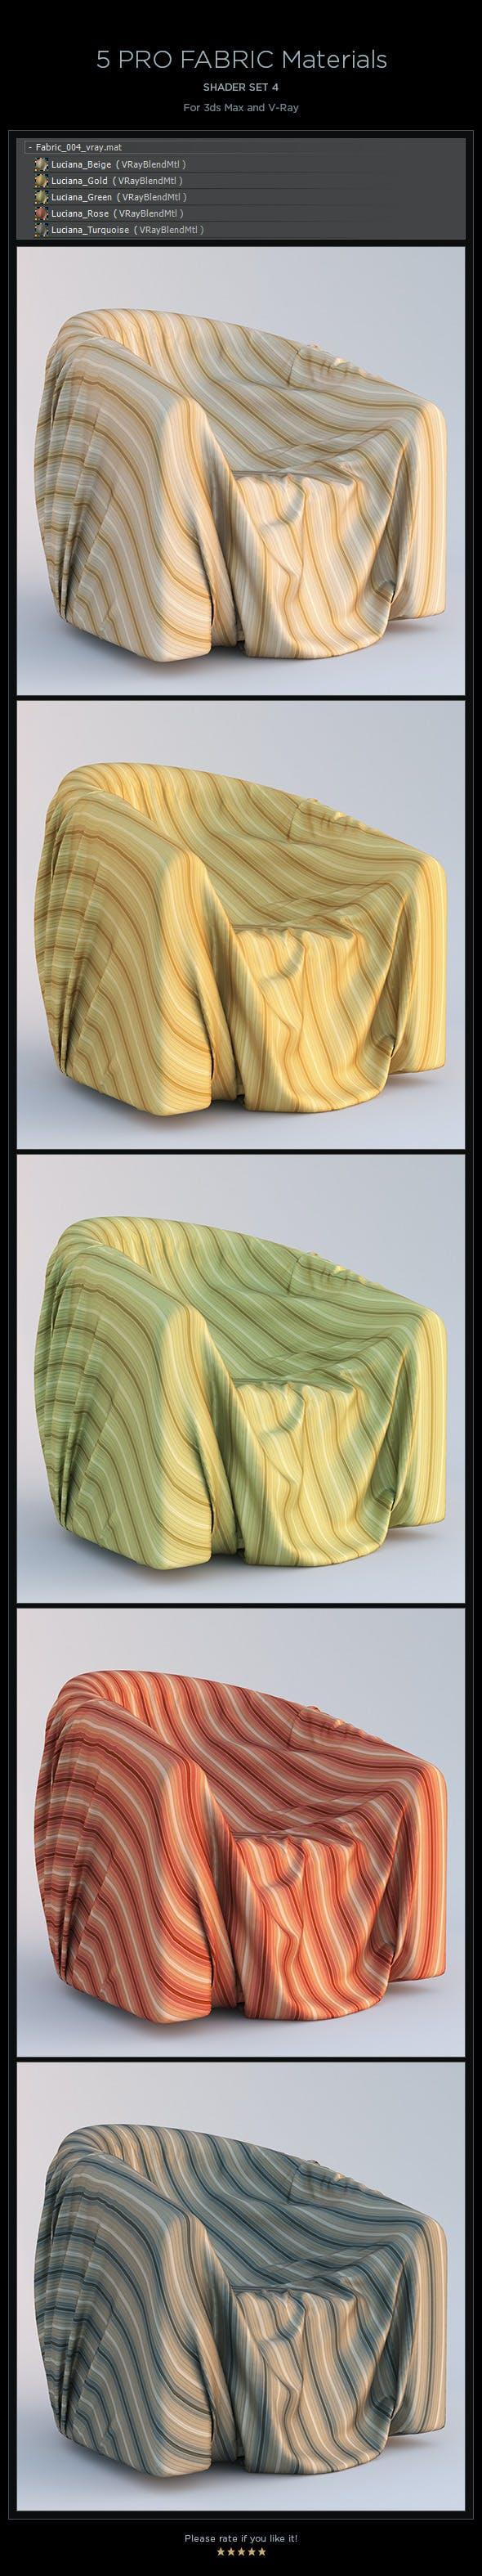 5 Pro Fabric Materials - set 4 - 3DOcean Item for Sale